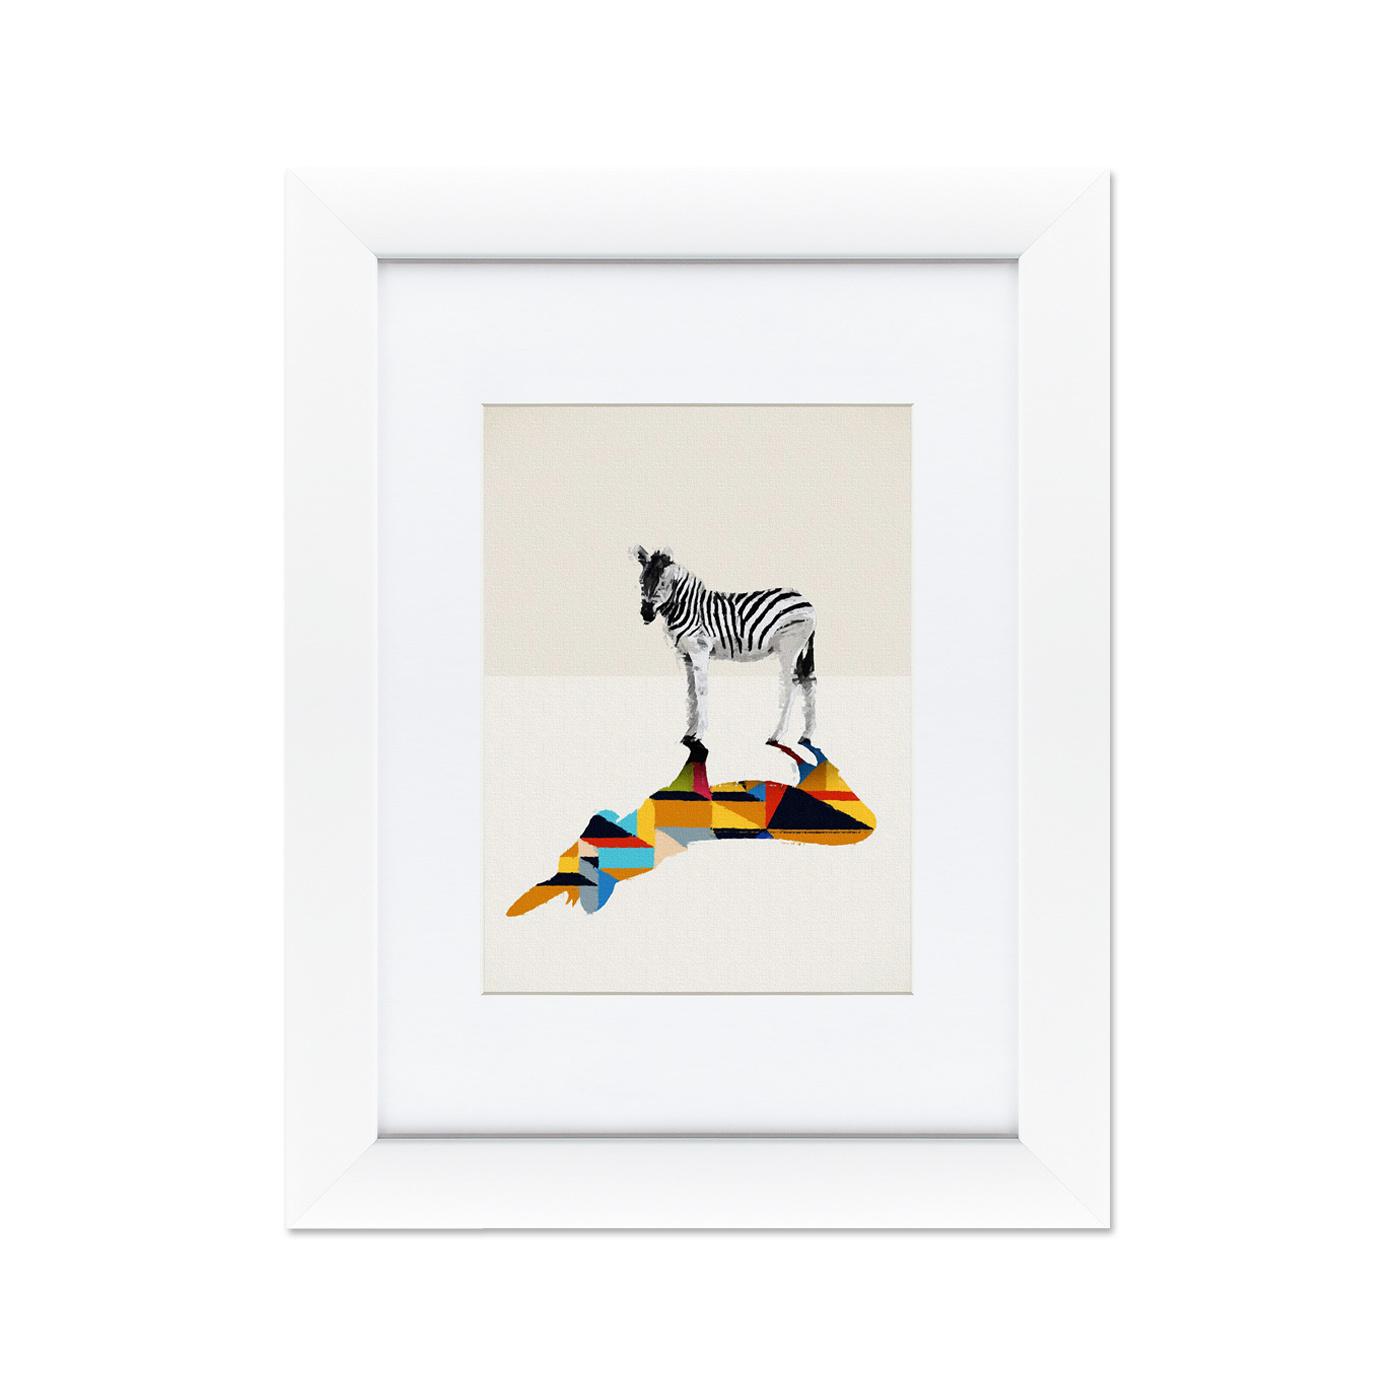 {} Картины в Квартиру Картина Зебра (35х45 см) картины в квартиру картина слон 79х100 см